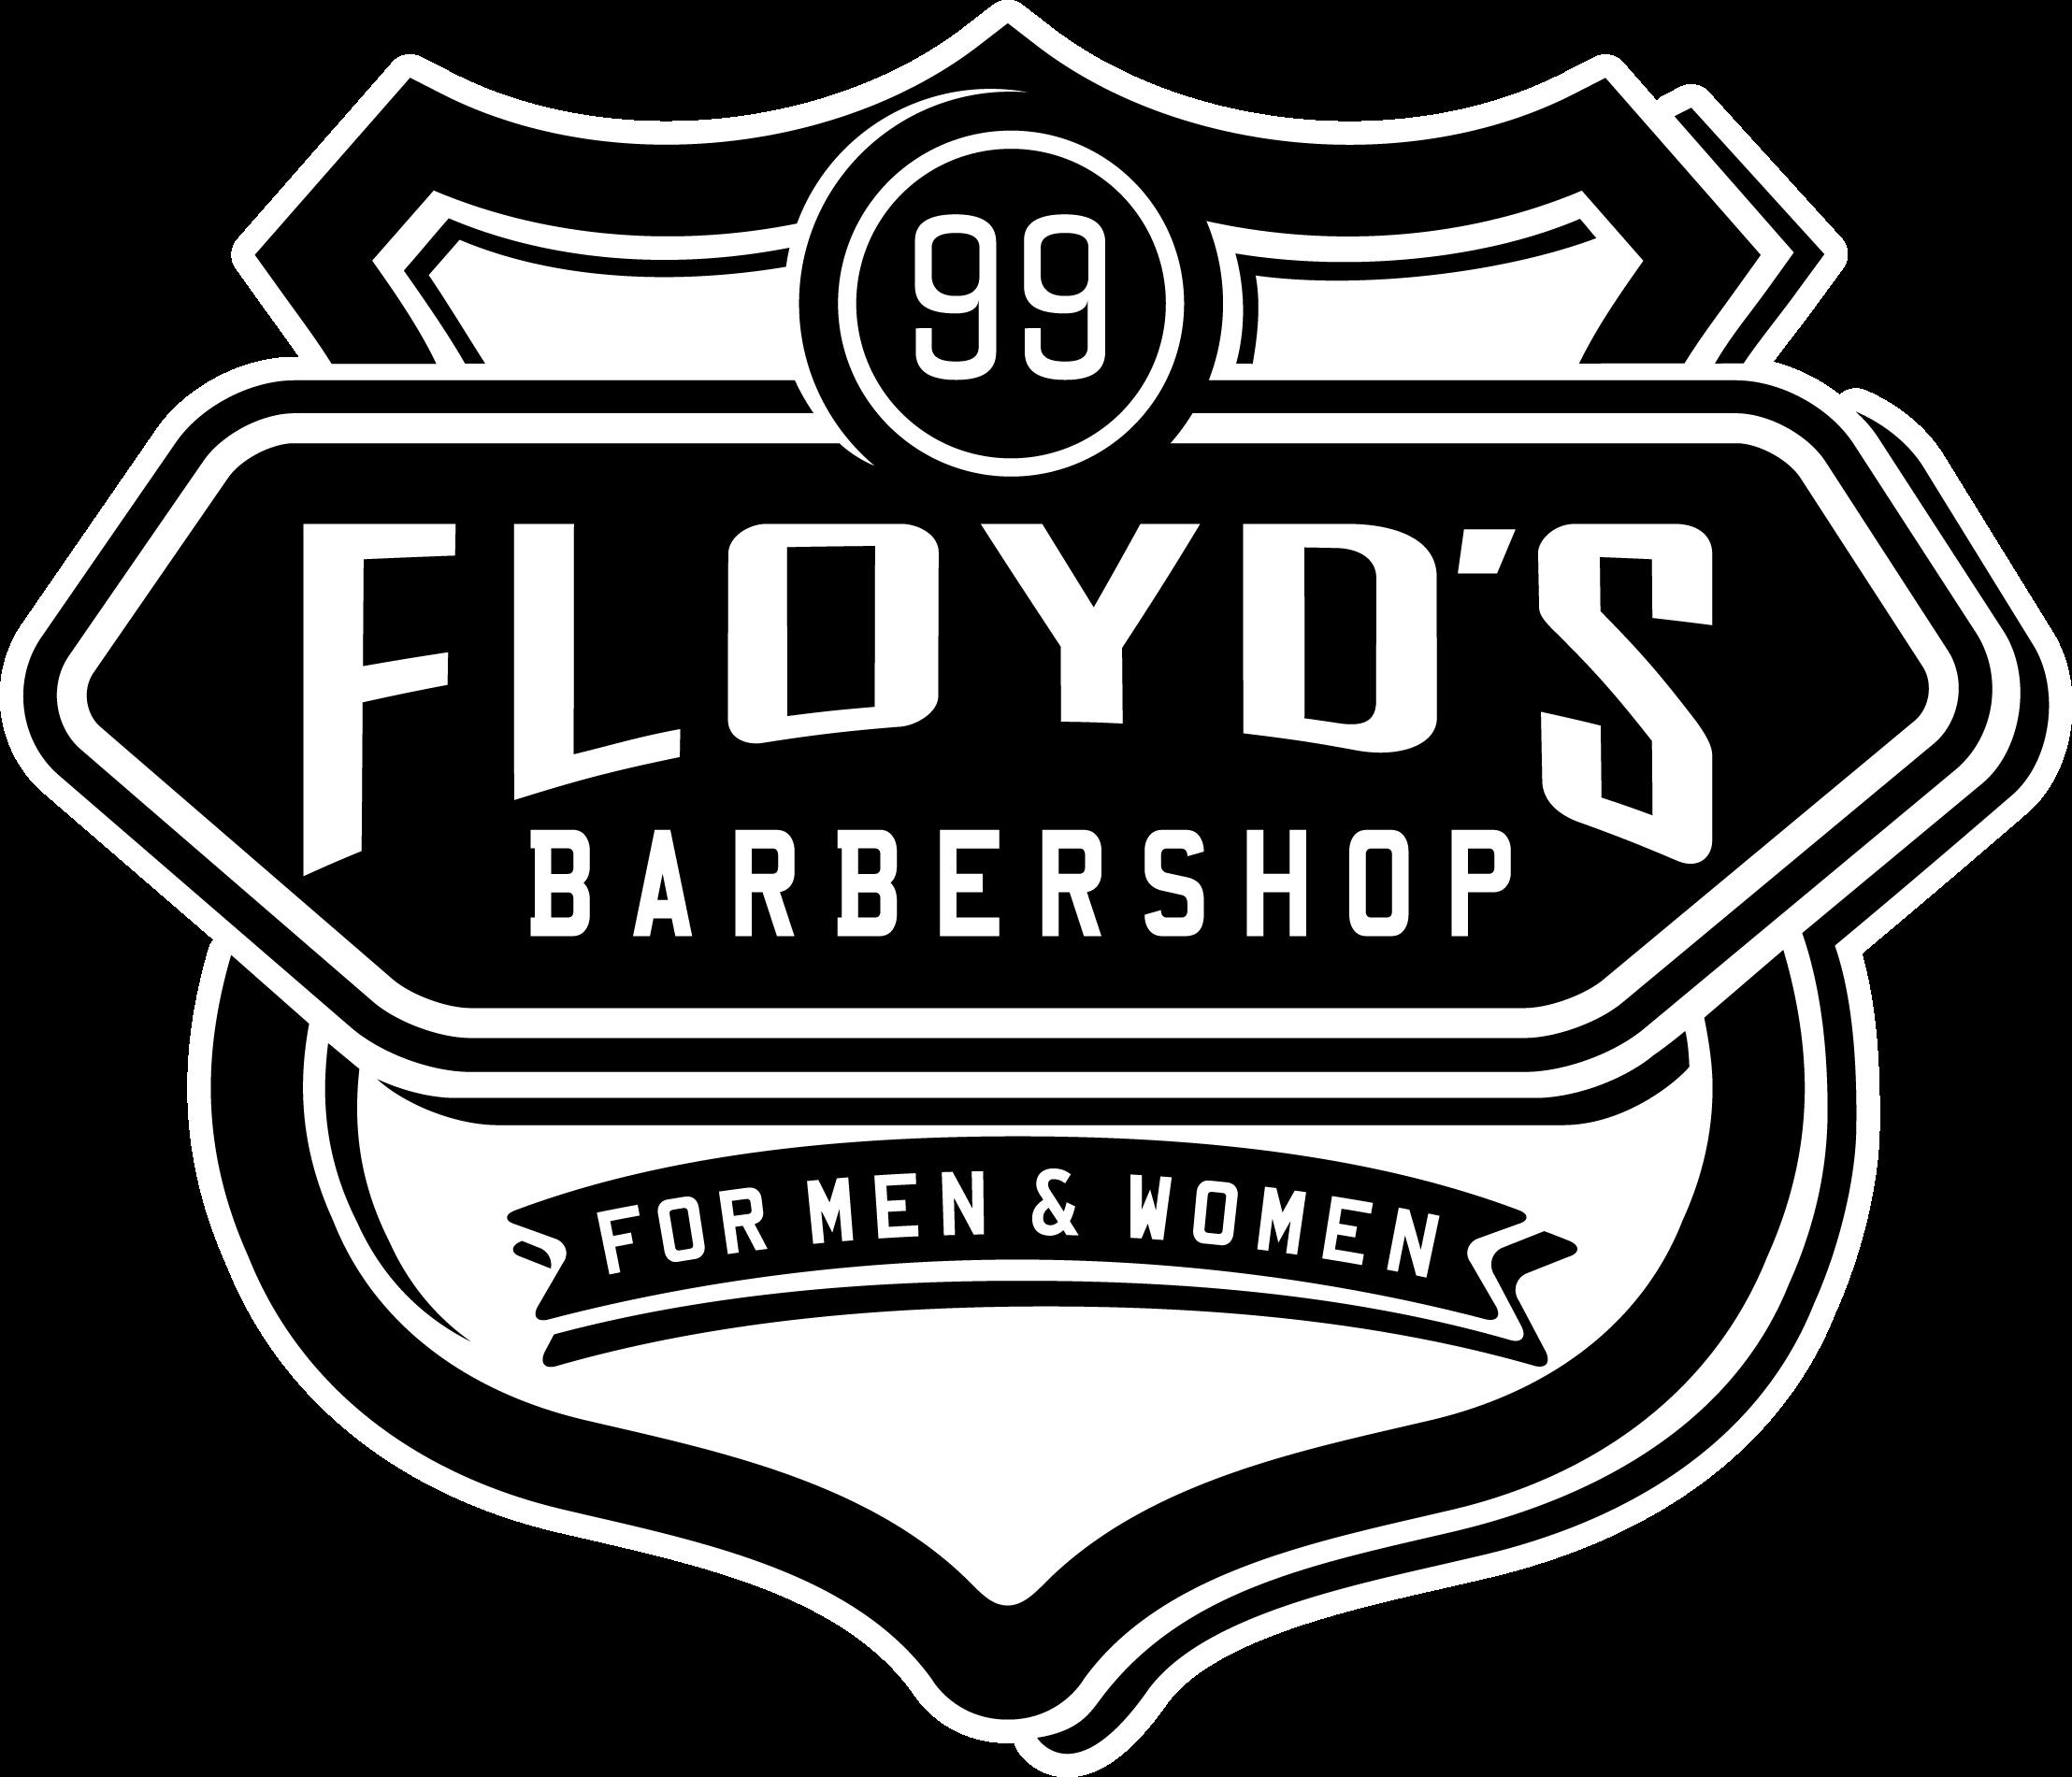 Floyd's